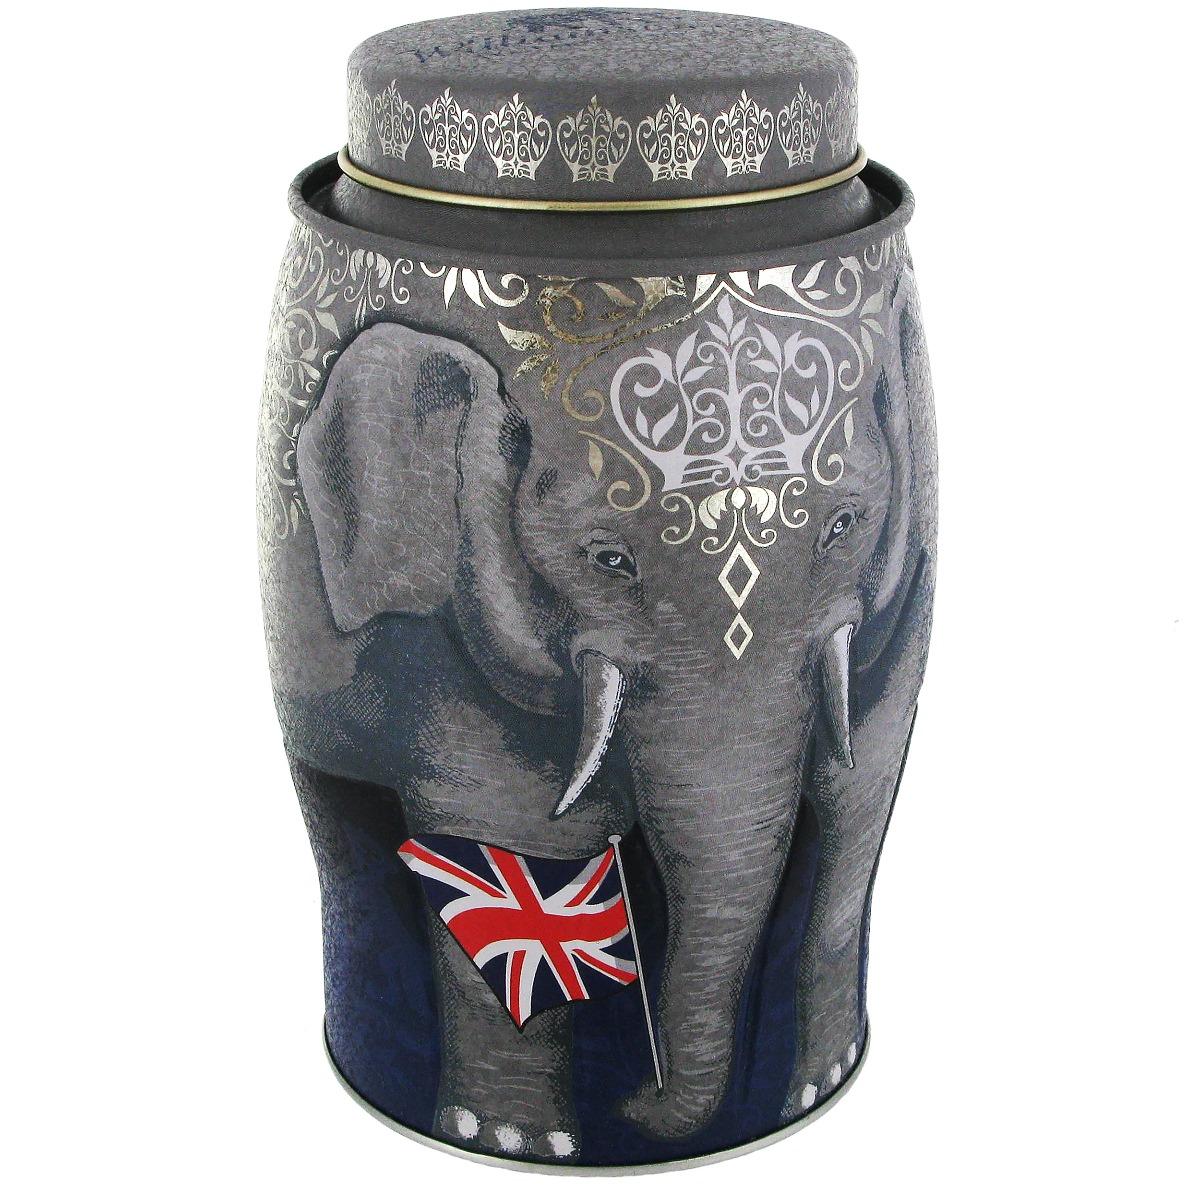 Elephant tea caddy with Earl Grey tea (Union Jack)